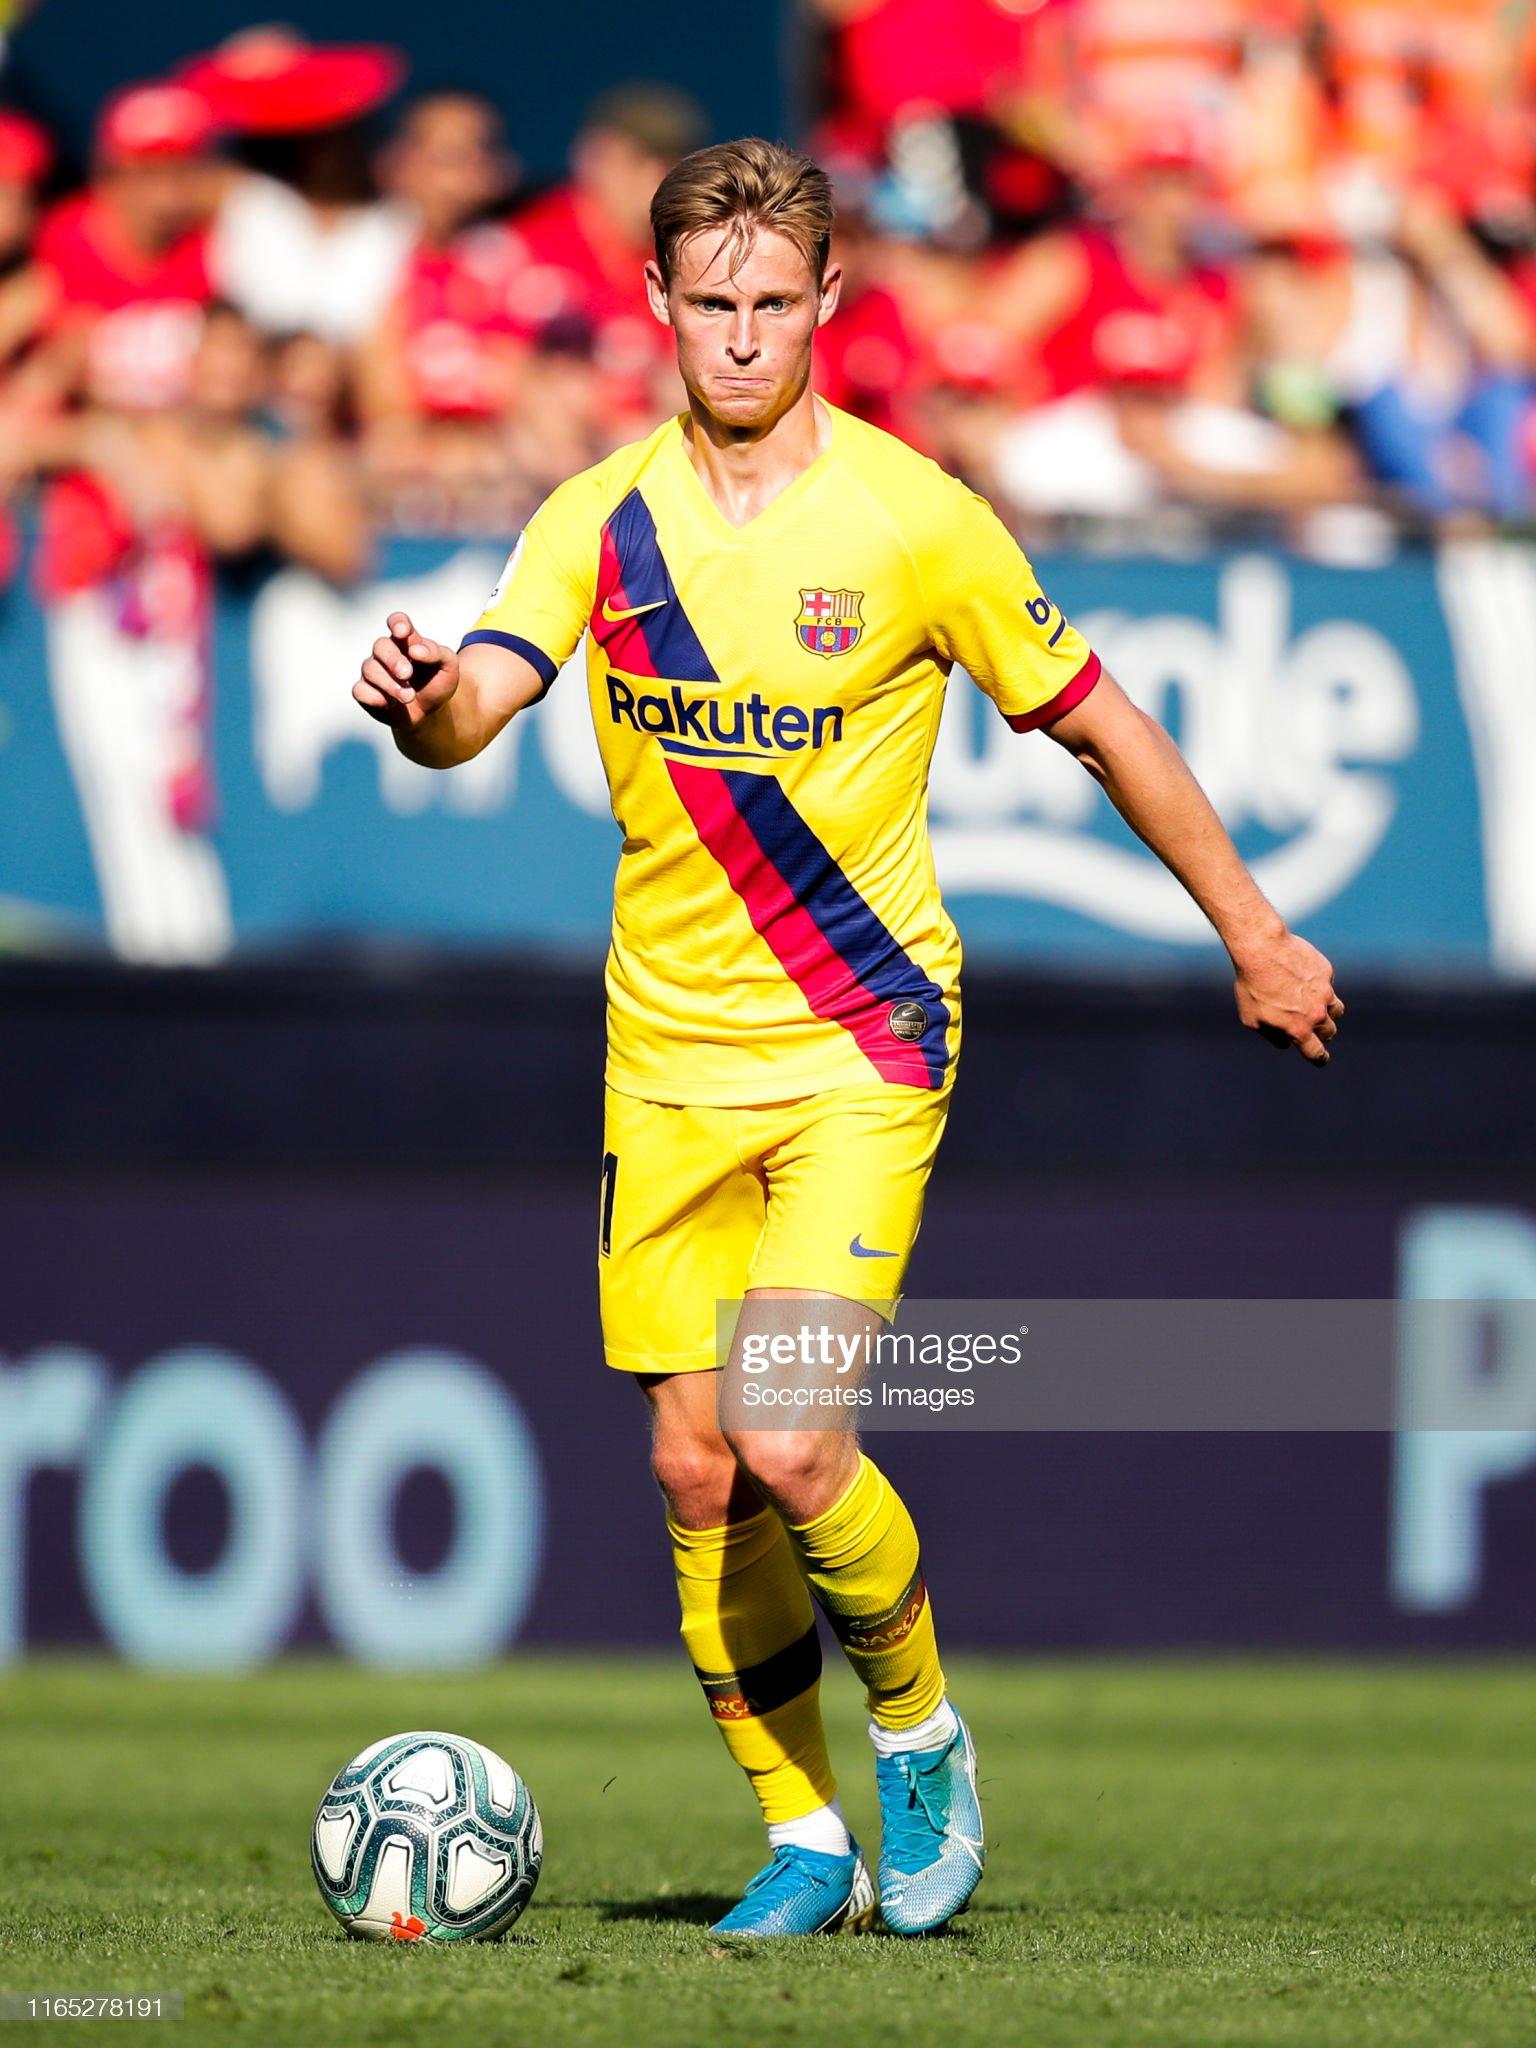 صور مباراة : أوساسونا - برشلونة 2-2 ( 31-08-2019 )  Frenkie-de-jong-of-fc-barcelona-during-the-la-liga-santander-match-picture-id1165278191?s=2048x2048